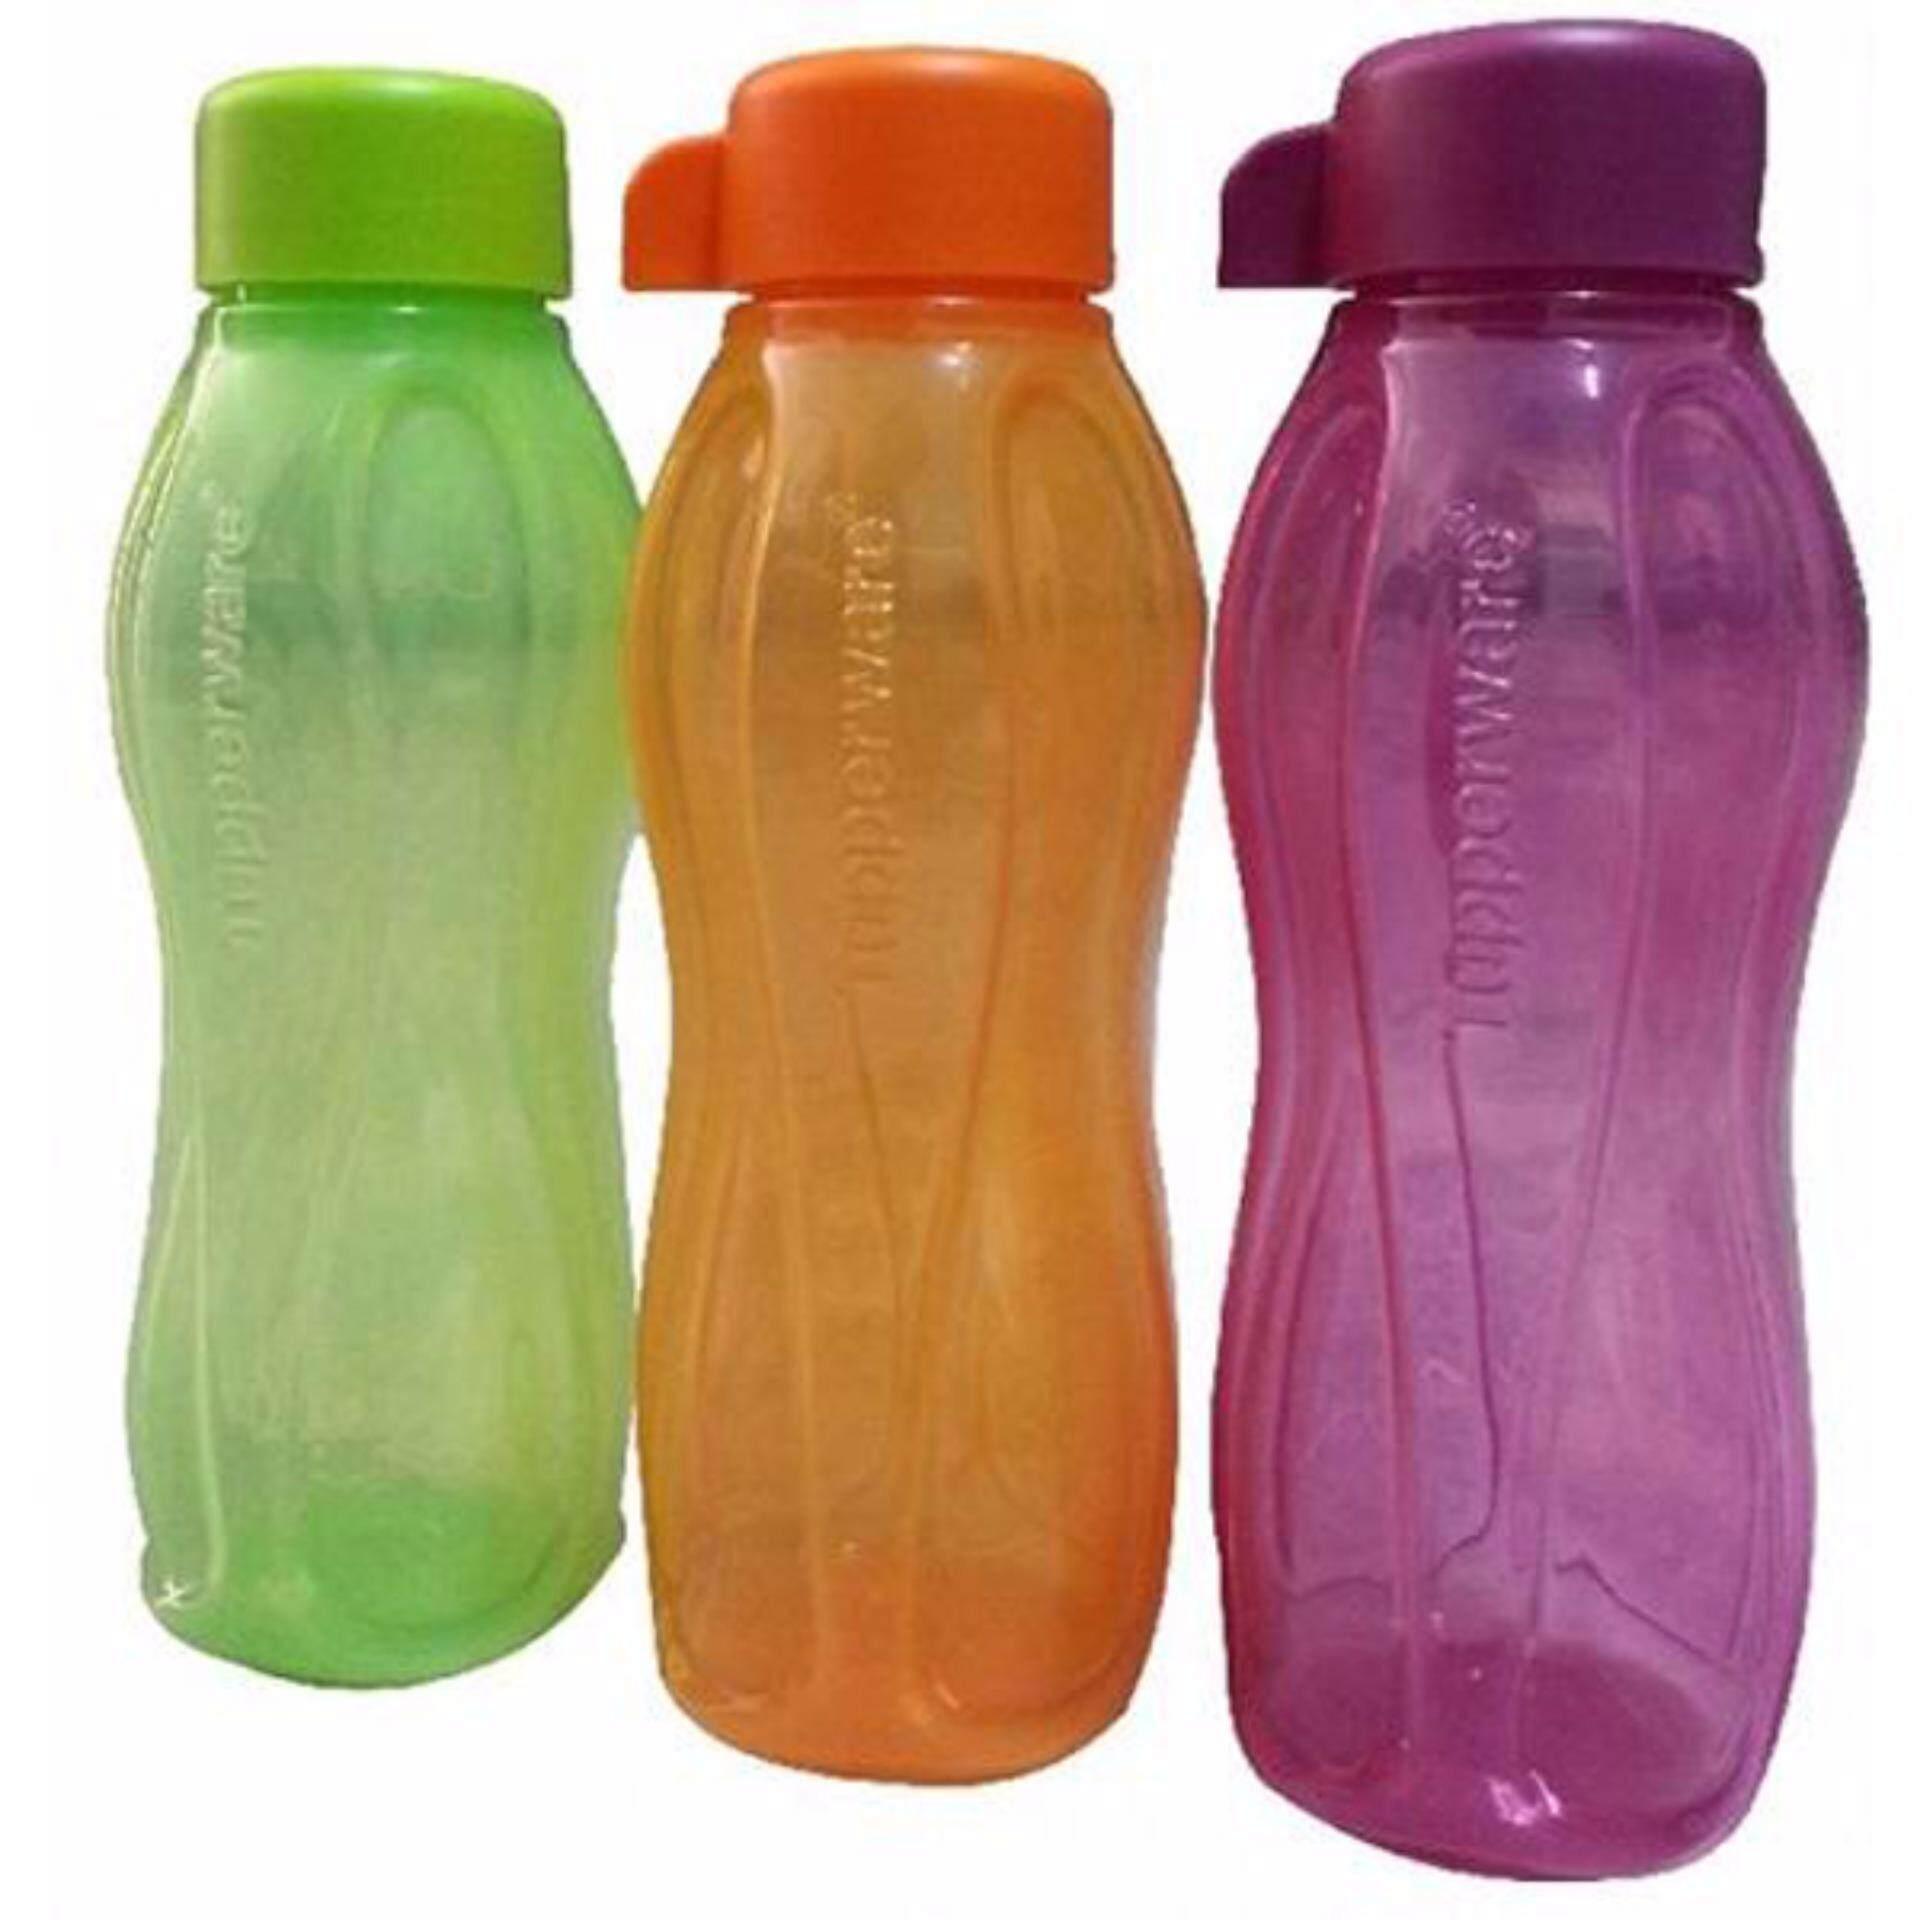 Tupperware Mini Eco Bottle (1)pc 310ml only - Random Color Send